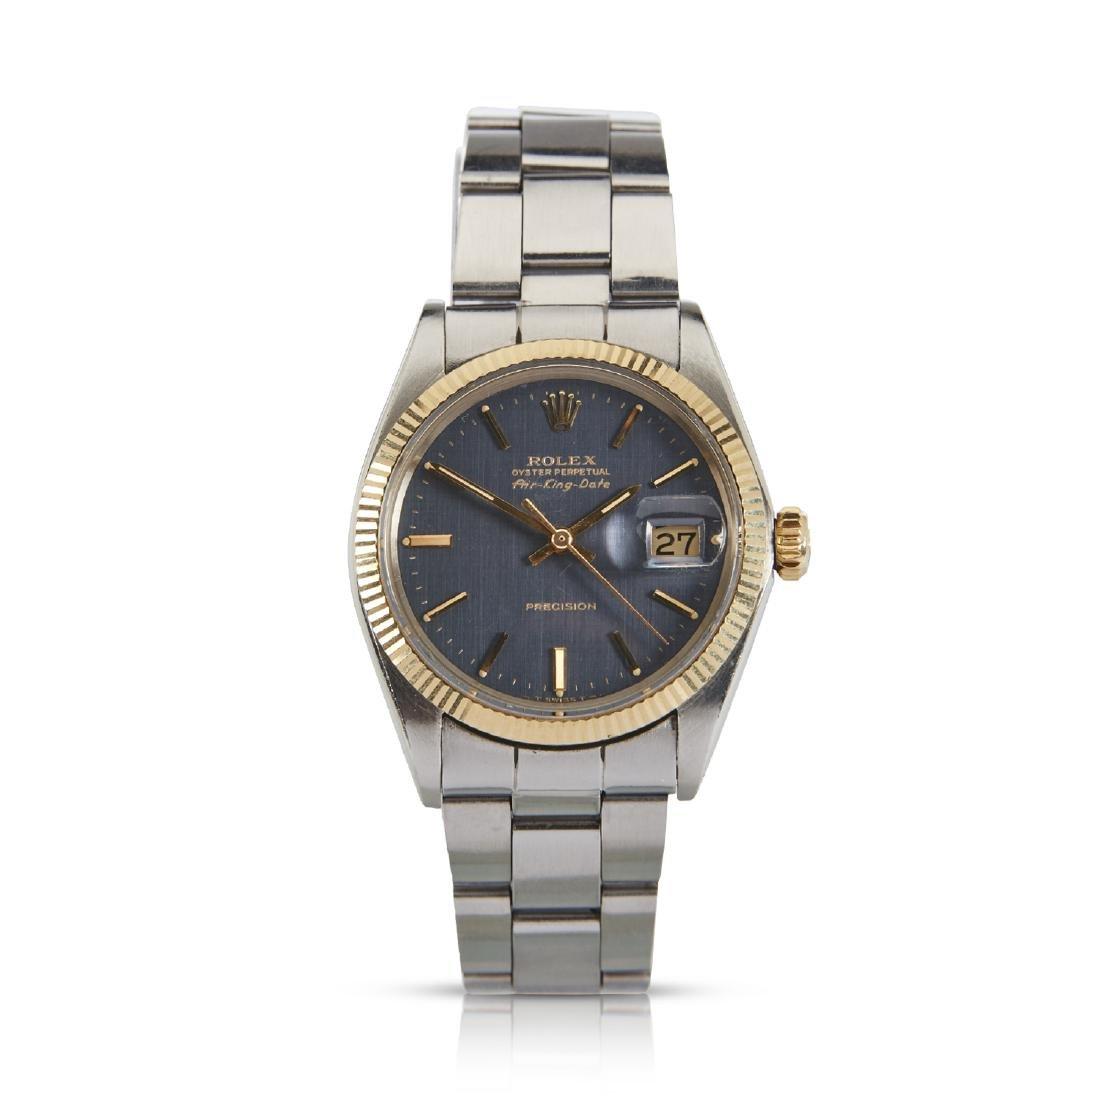 Rolex, Air King Date, Ref. 5701